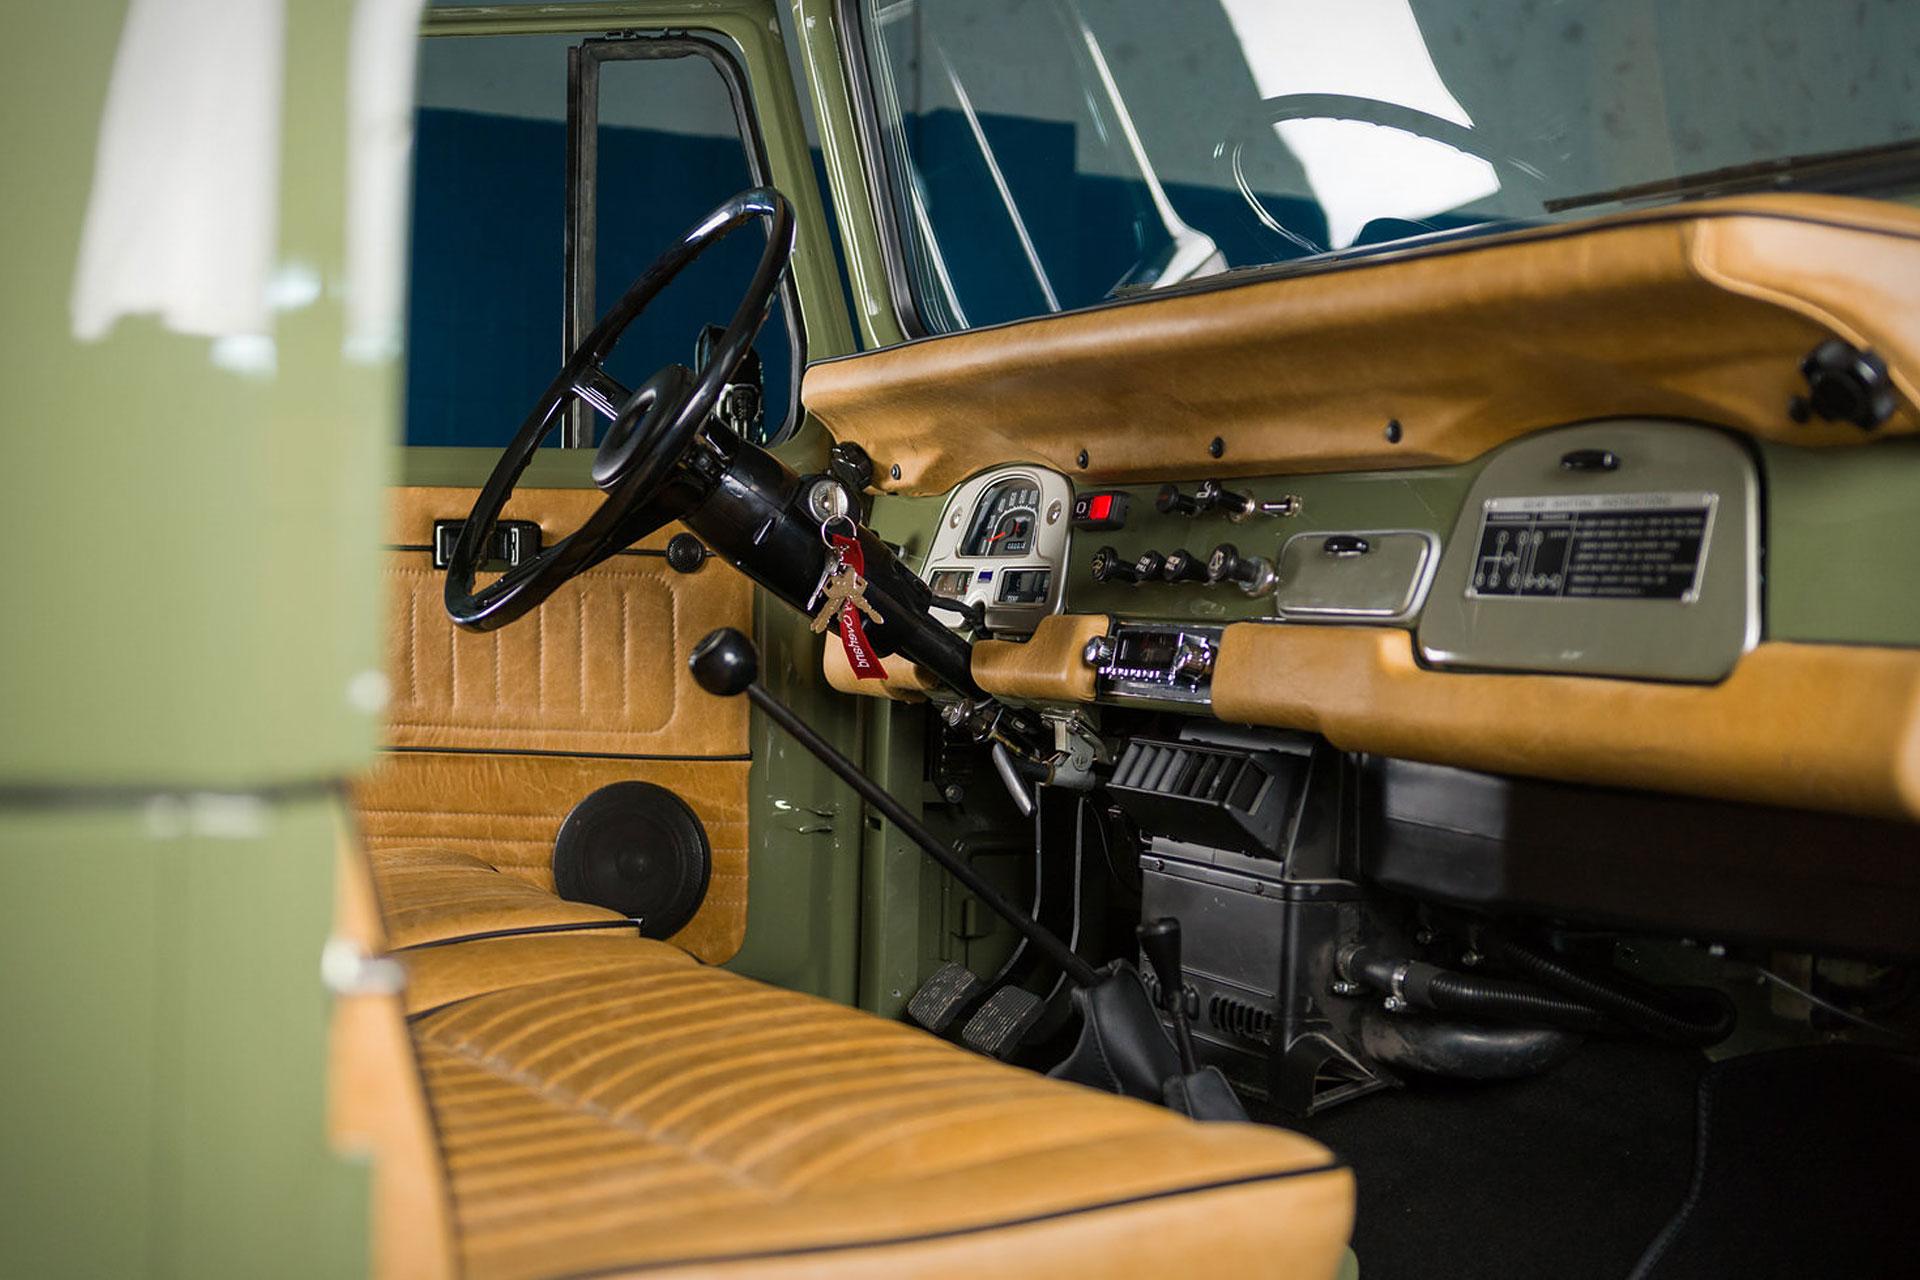 toyota-hj-45-truck-3.jpg